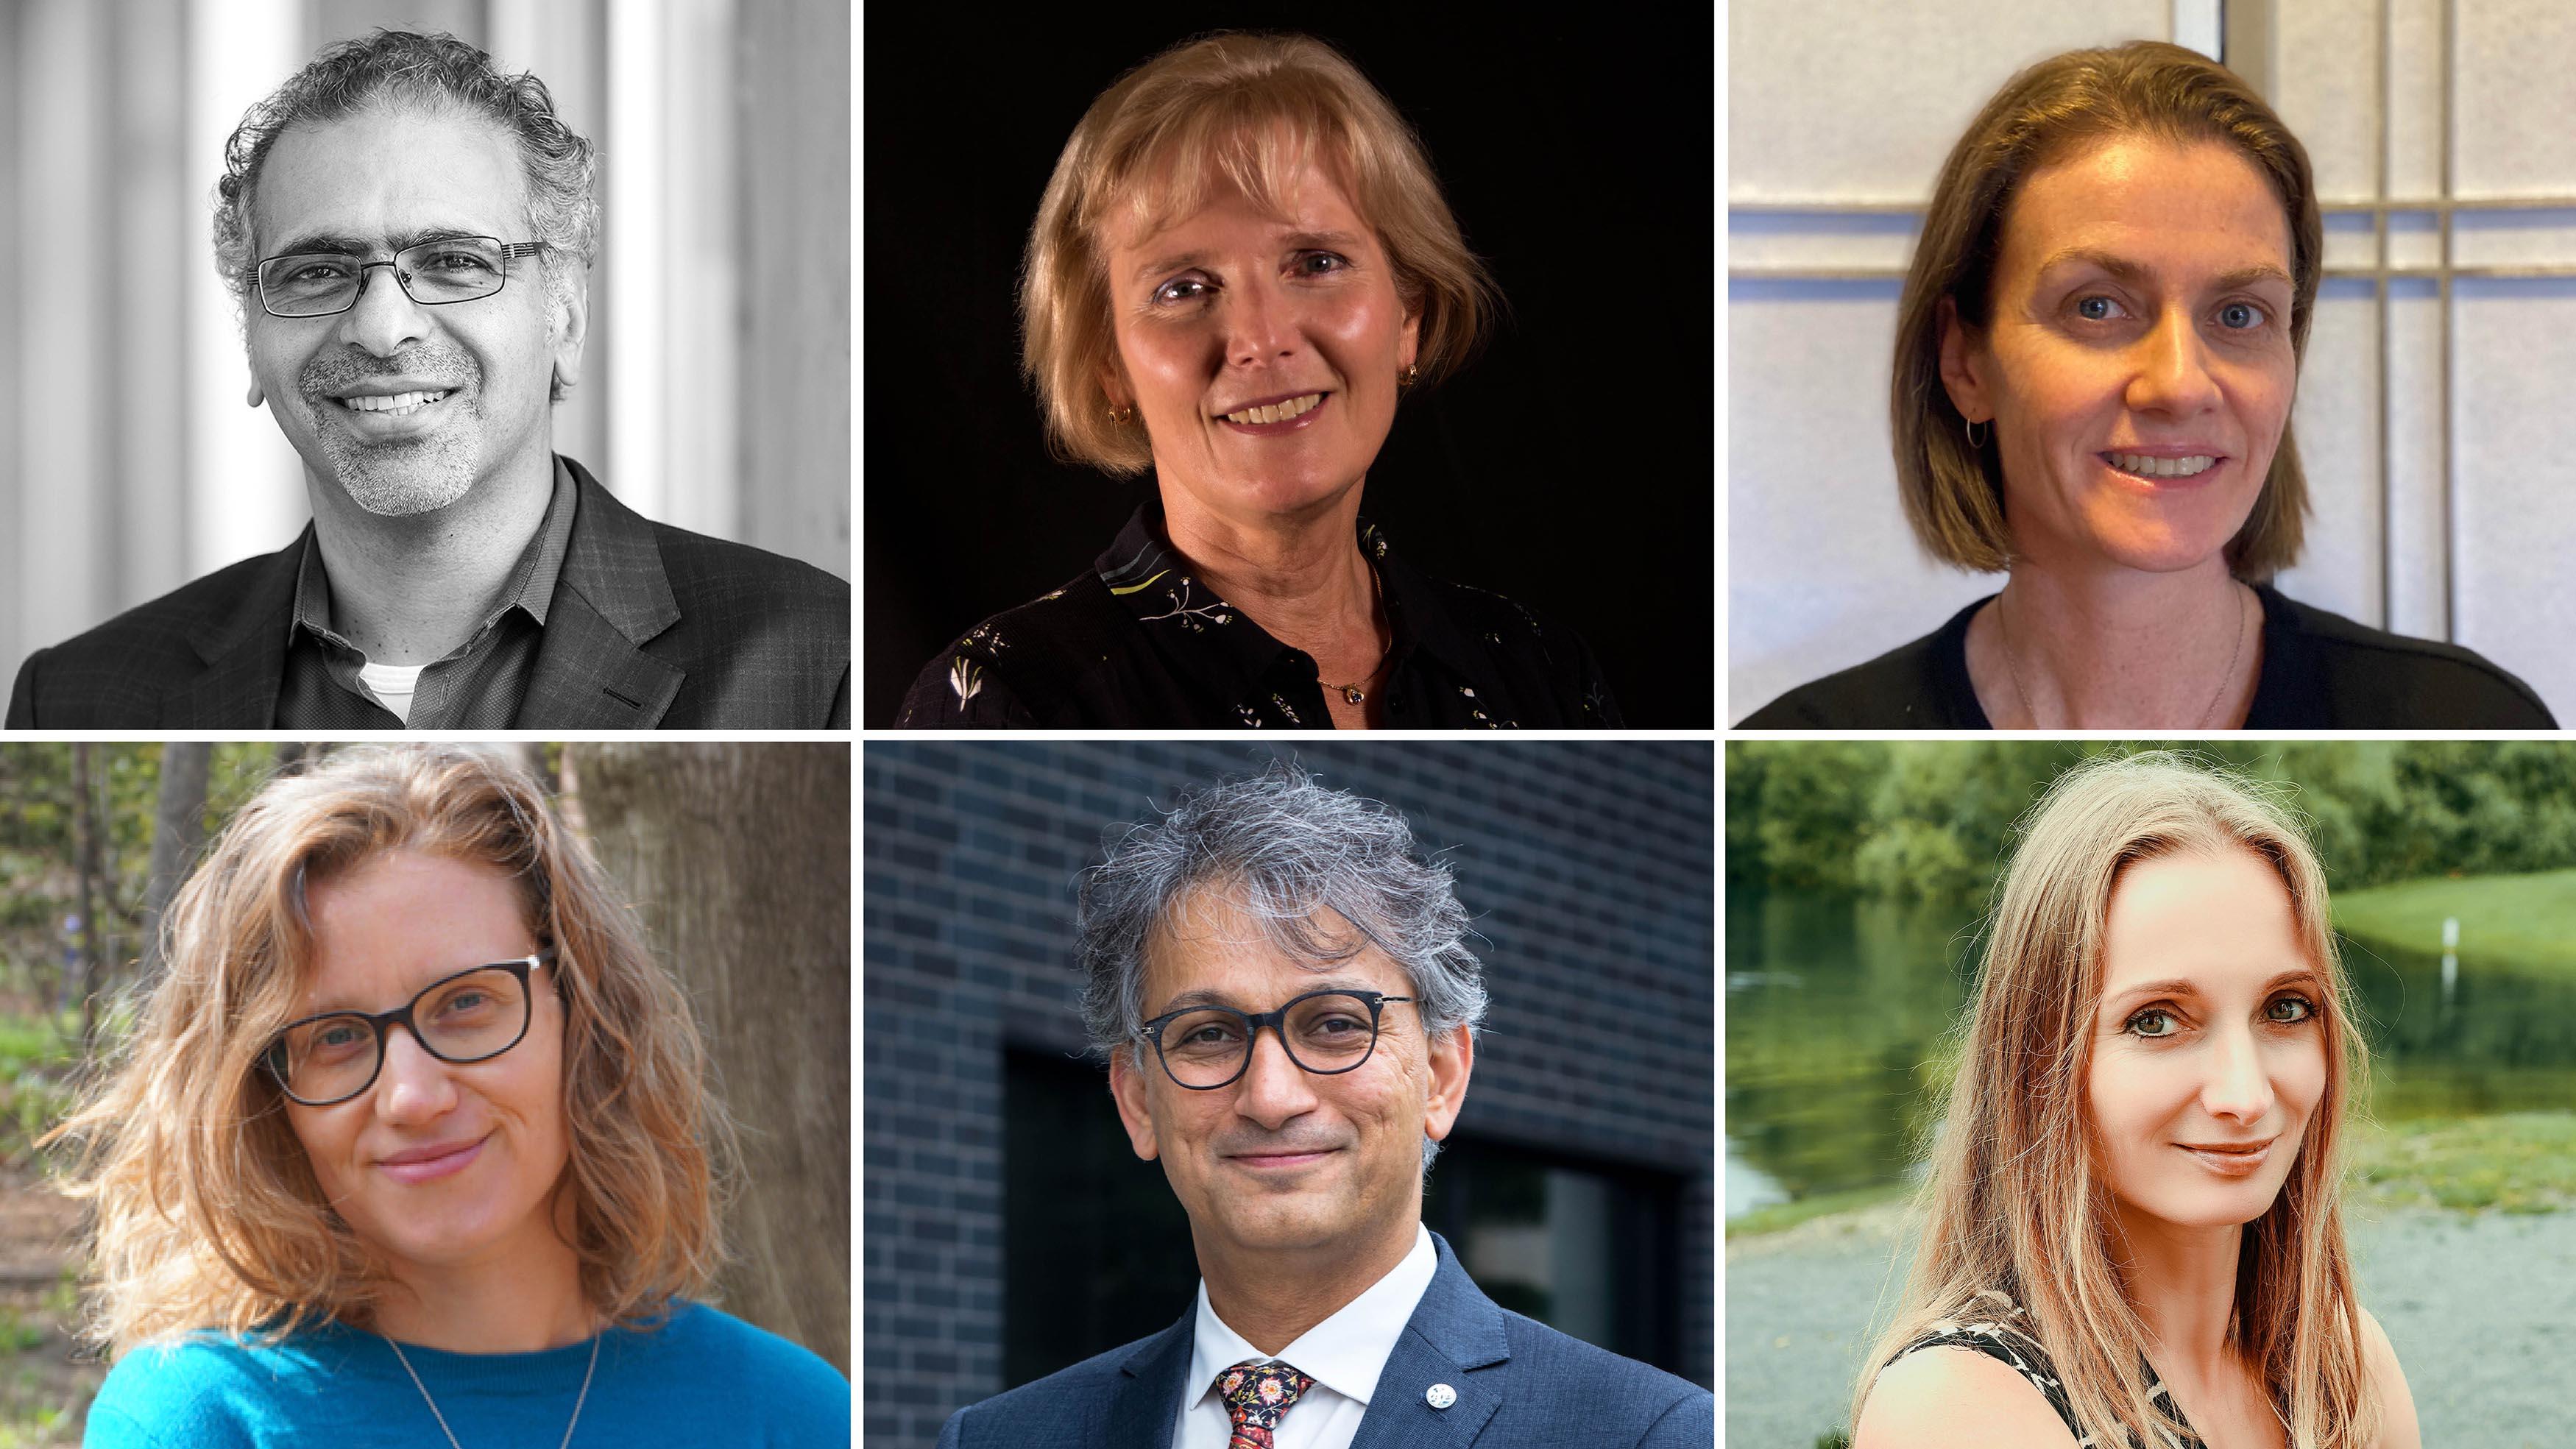 Six uOttawa professors: Khaled El Emam, Rita Horvath, Carole Yauk, Emmanuelle Bernheim, Ebrahim Karimi and Ksenia Dolgaleva